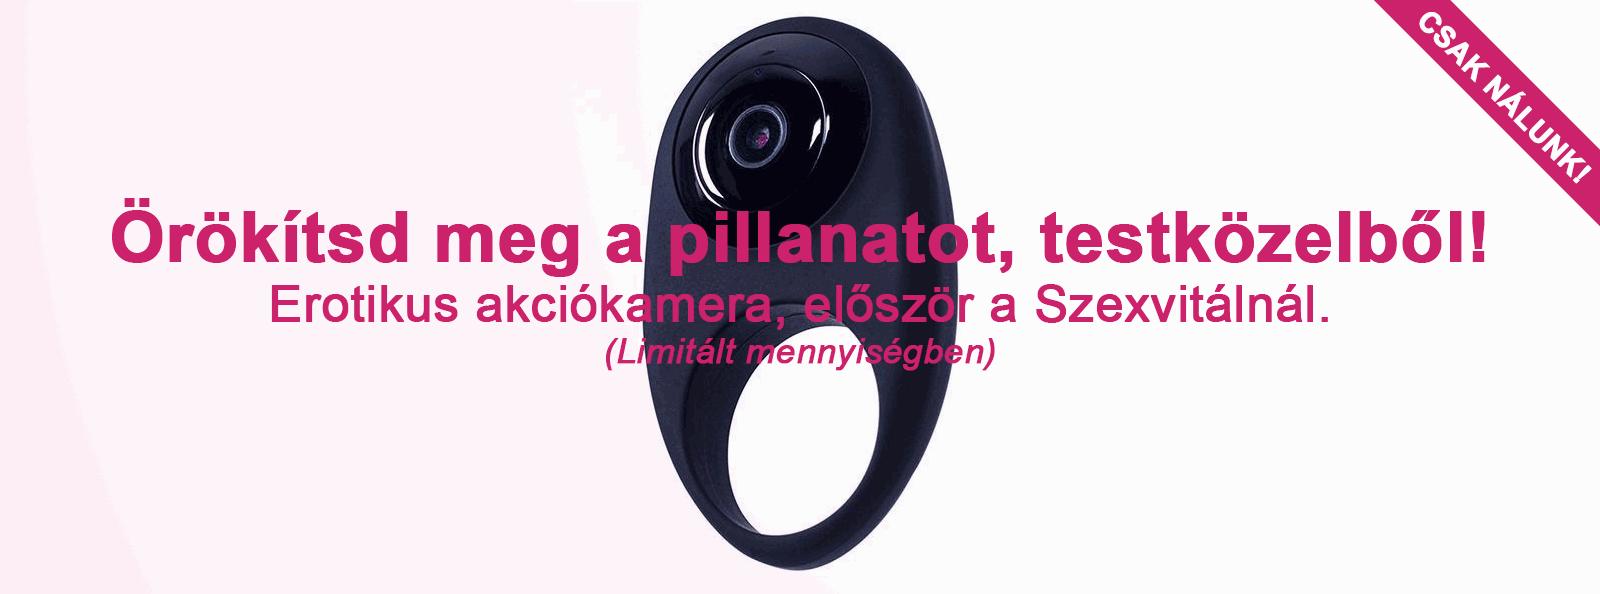 szex-akciokamera-4